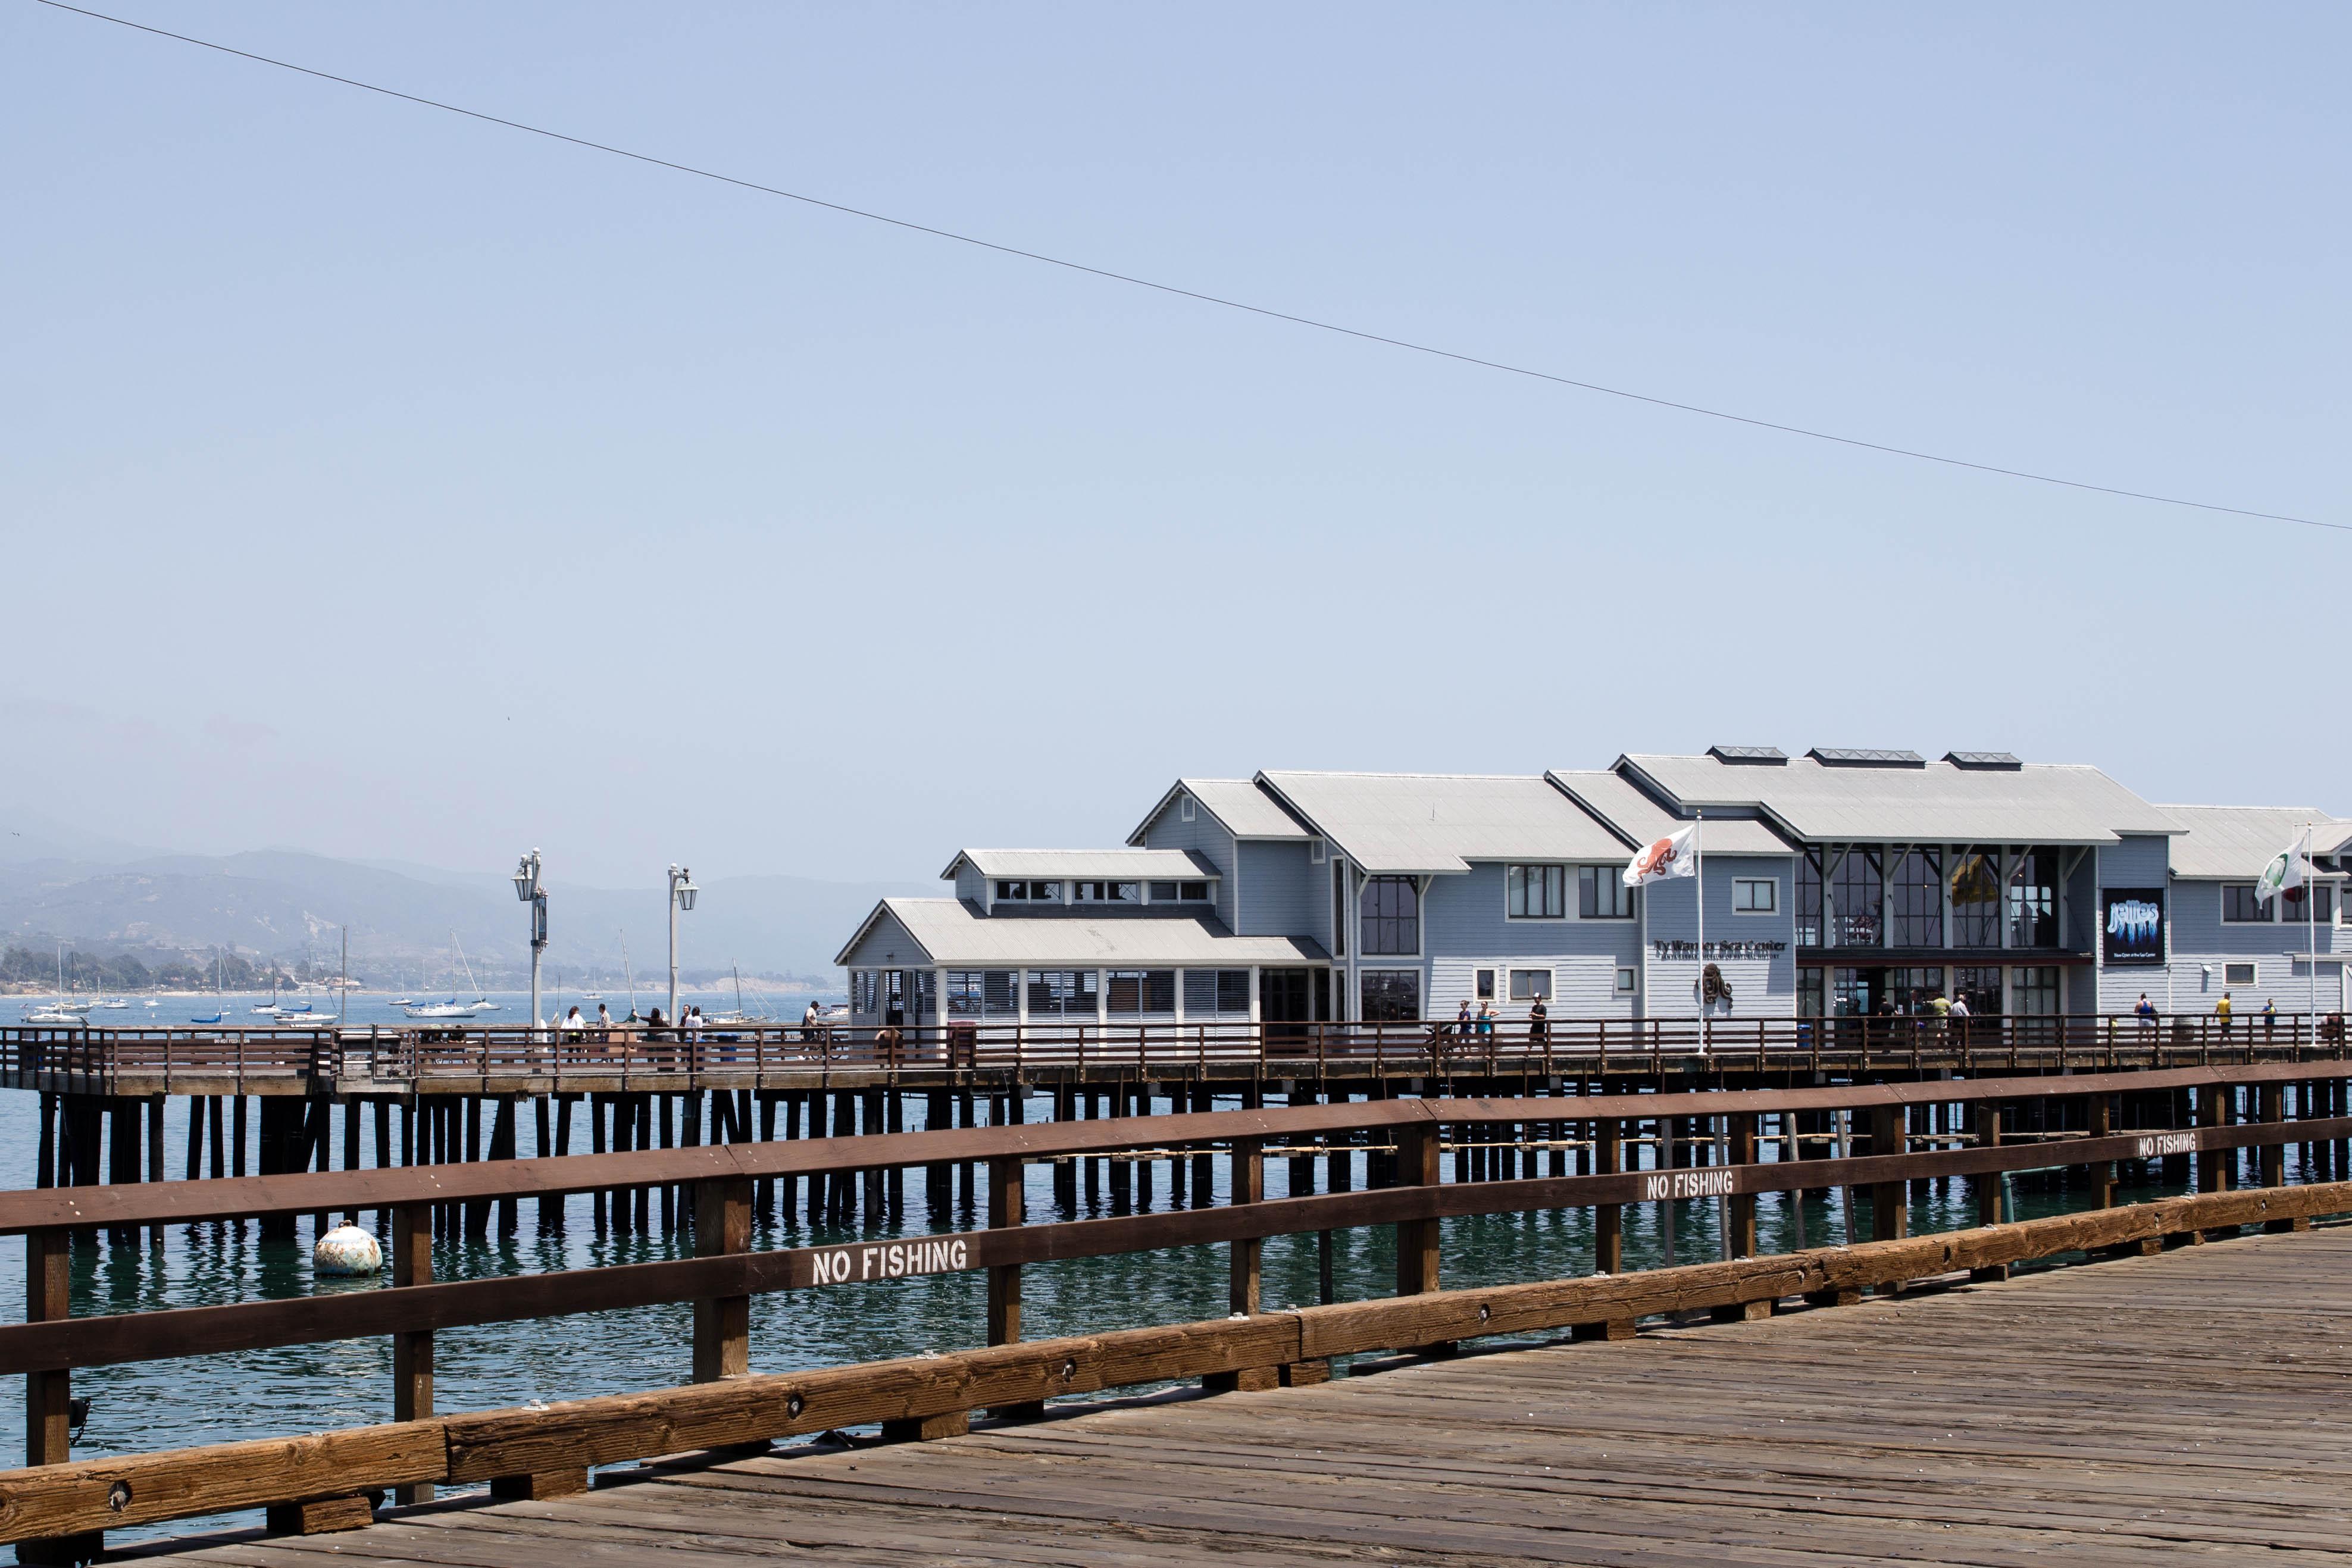 Beach Sea Coast Dock Boardwalk Town Pier Walkway Vehicle Marina California Santabarbara Residential Area